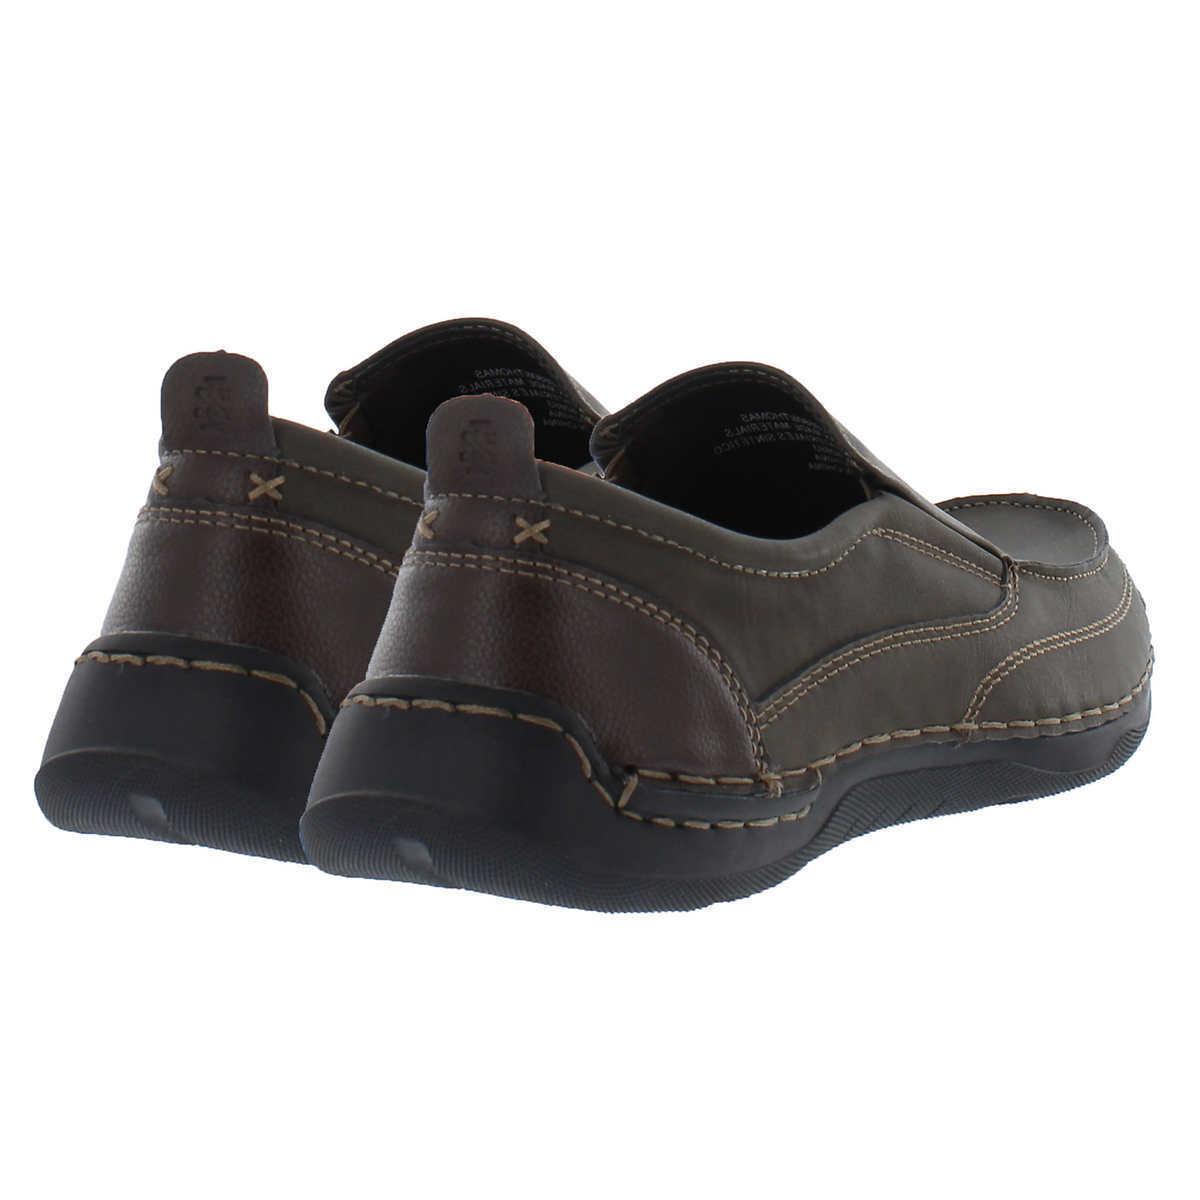 Izod Thomas Men's Slip On Shoe Memory Foam Flexible LightWeight Loafer 1